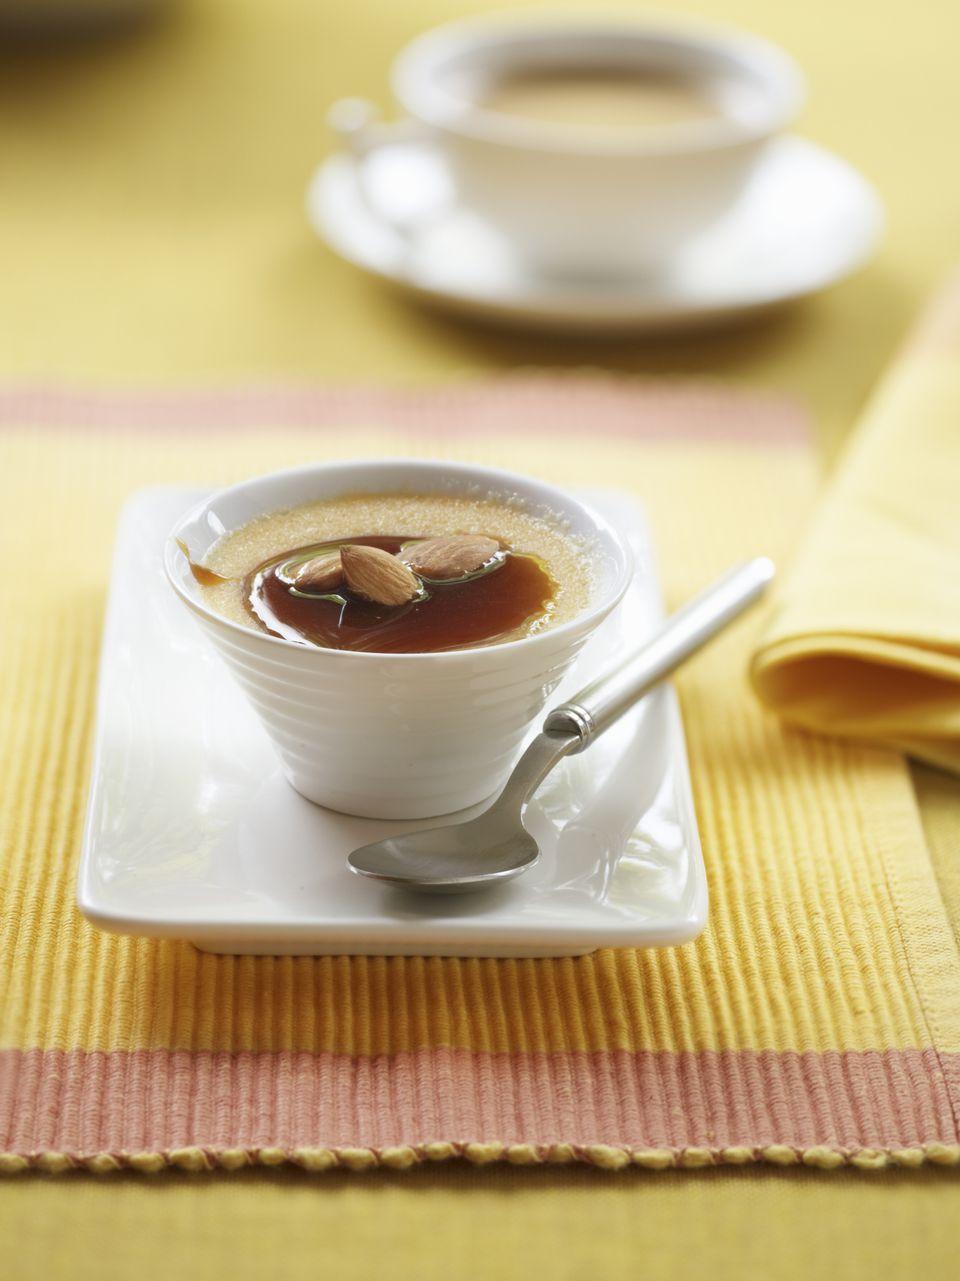 Spanish almond cream with caramel